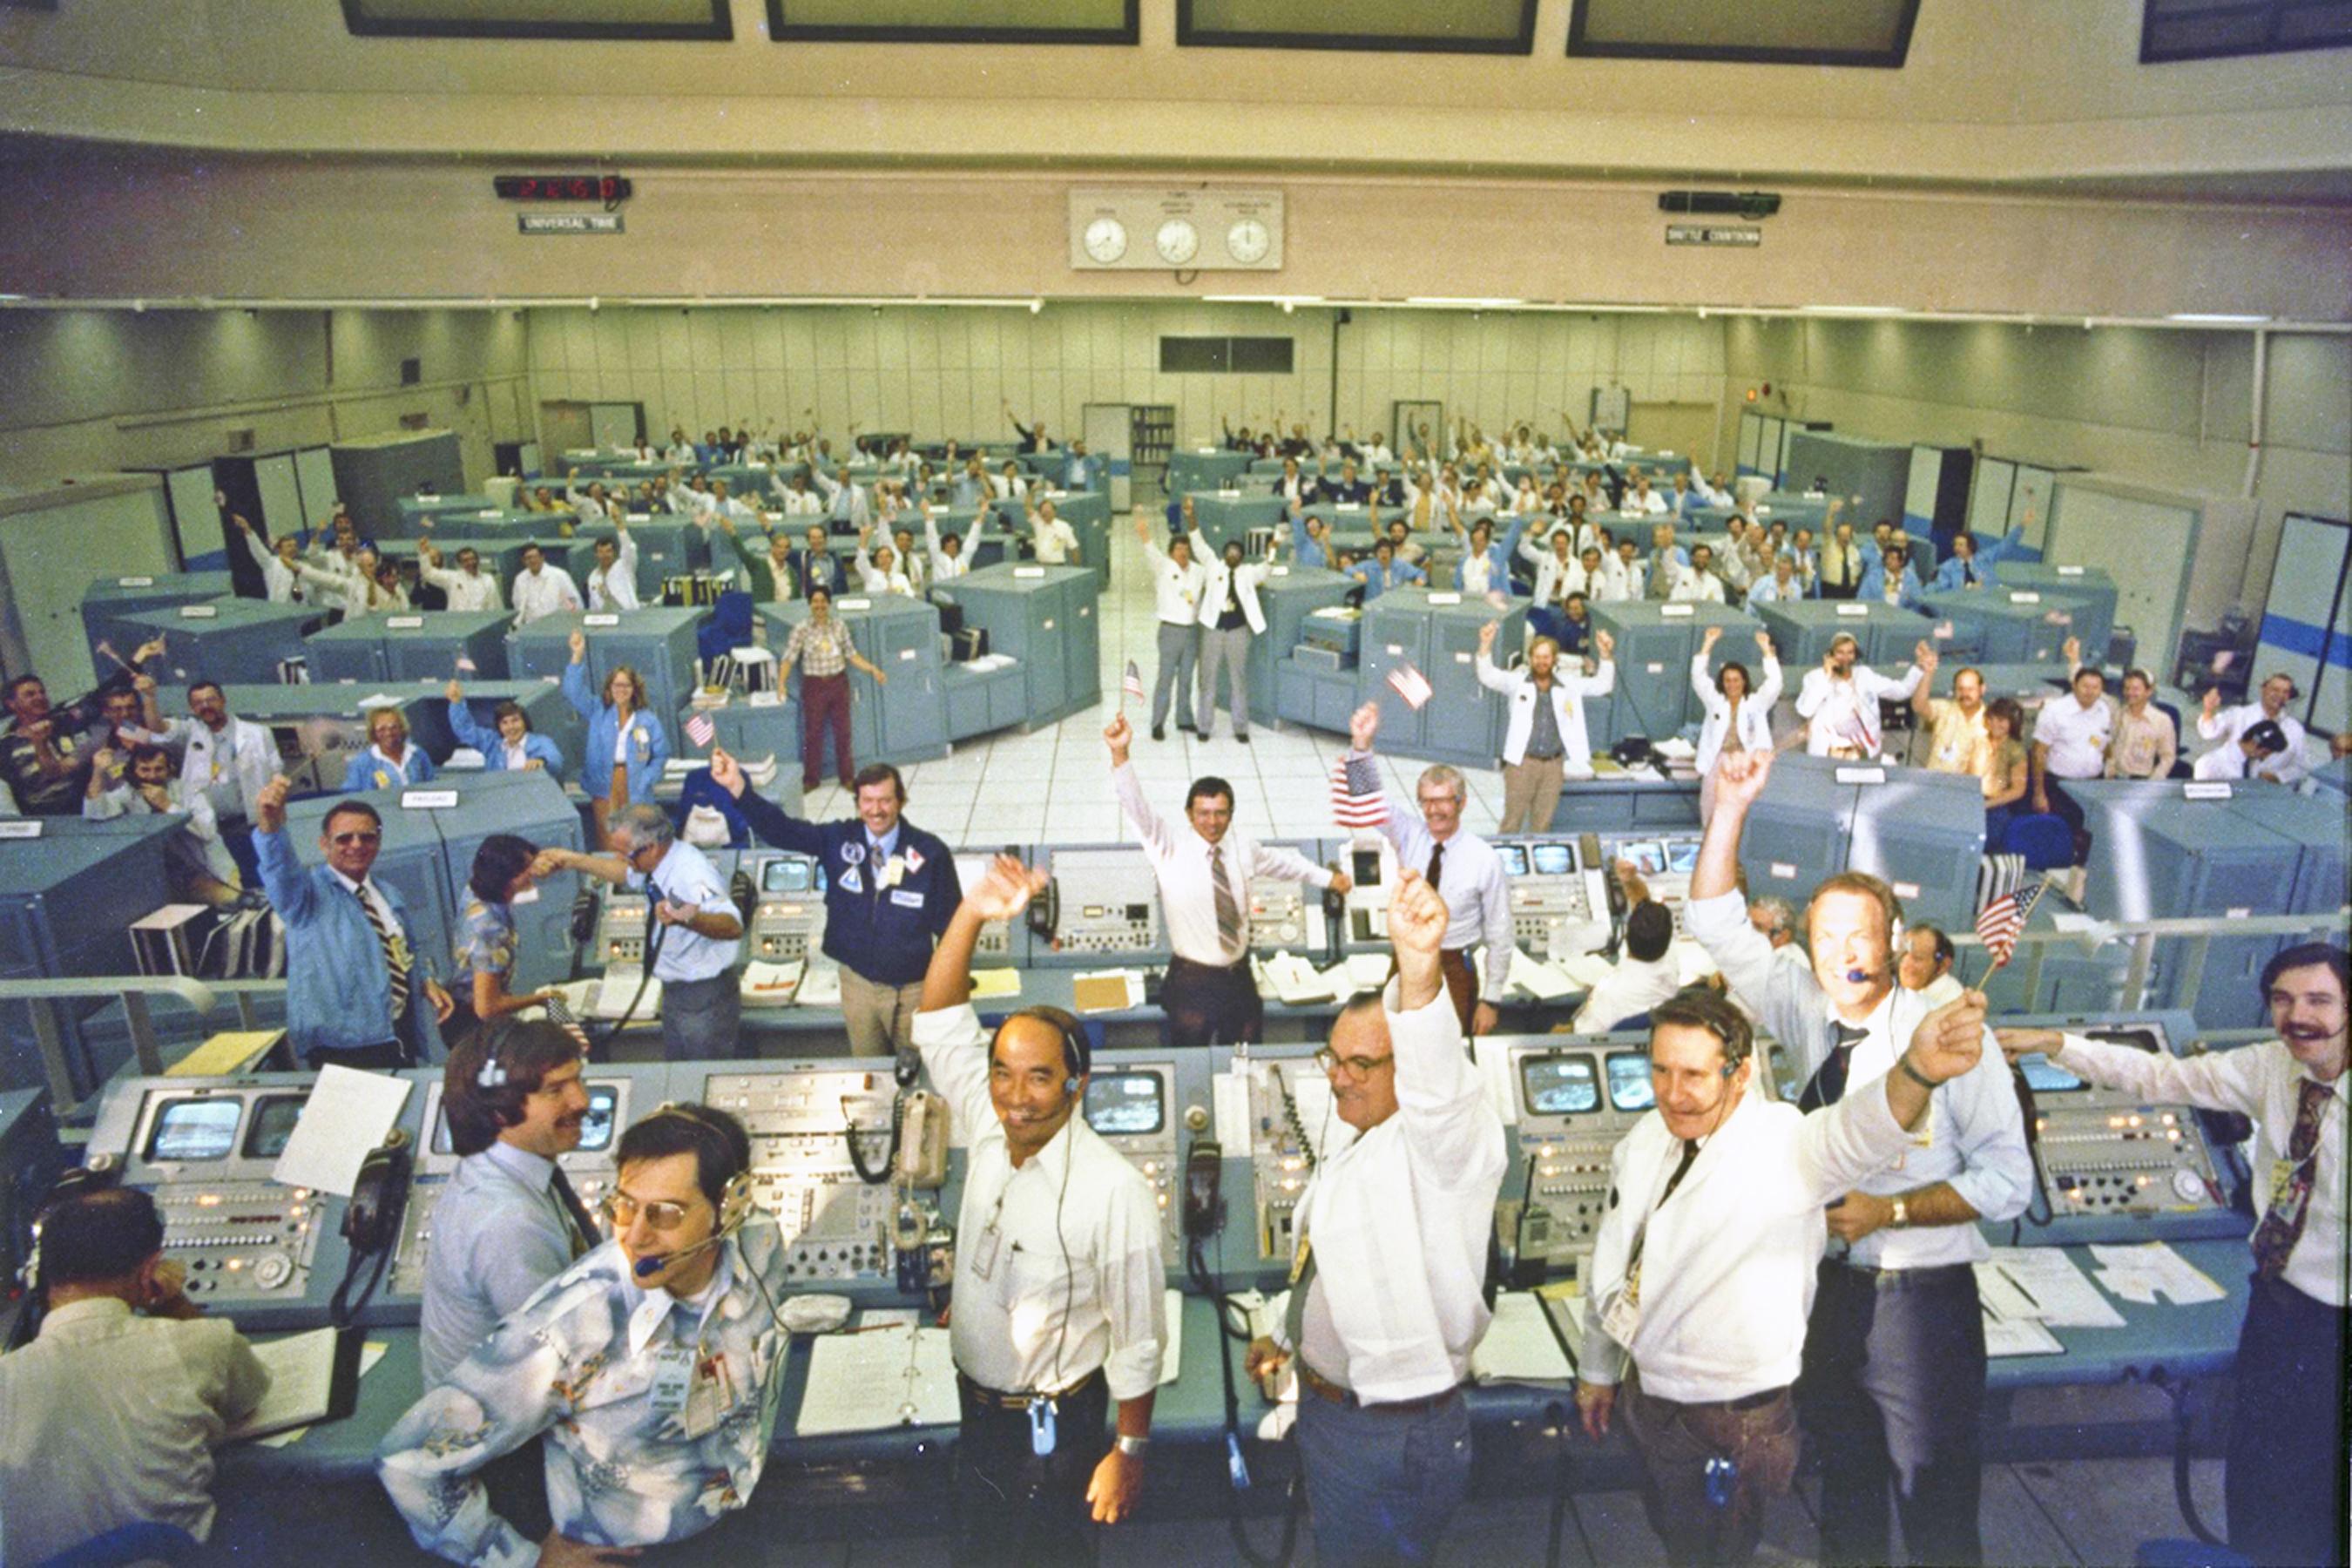 NASA - 1980s: All Eyes Focus on Space Shuttle